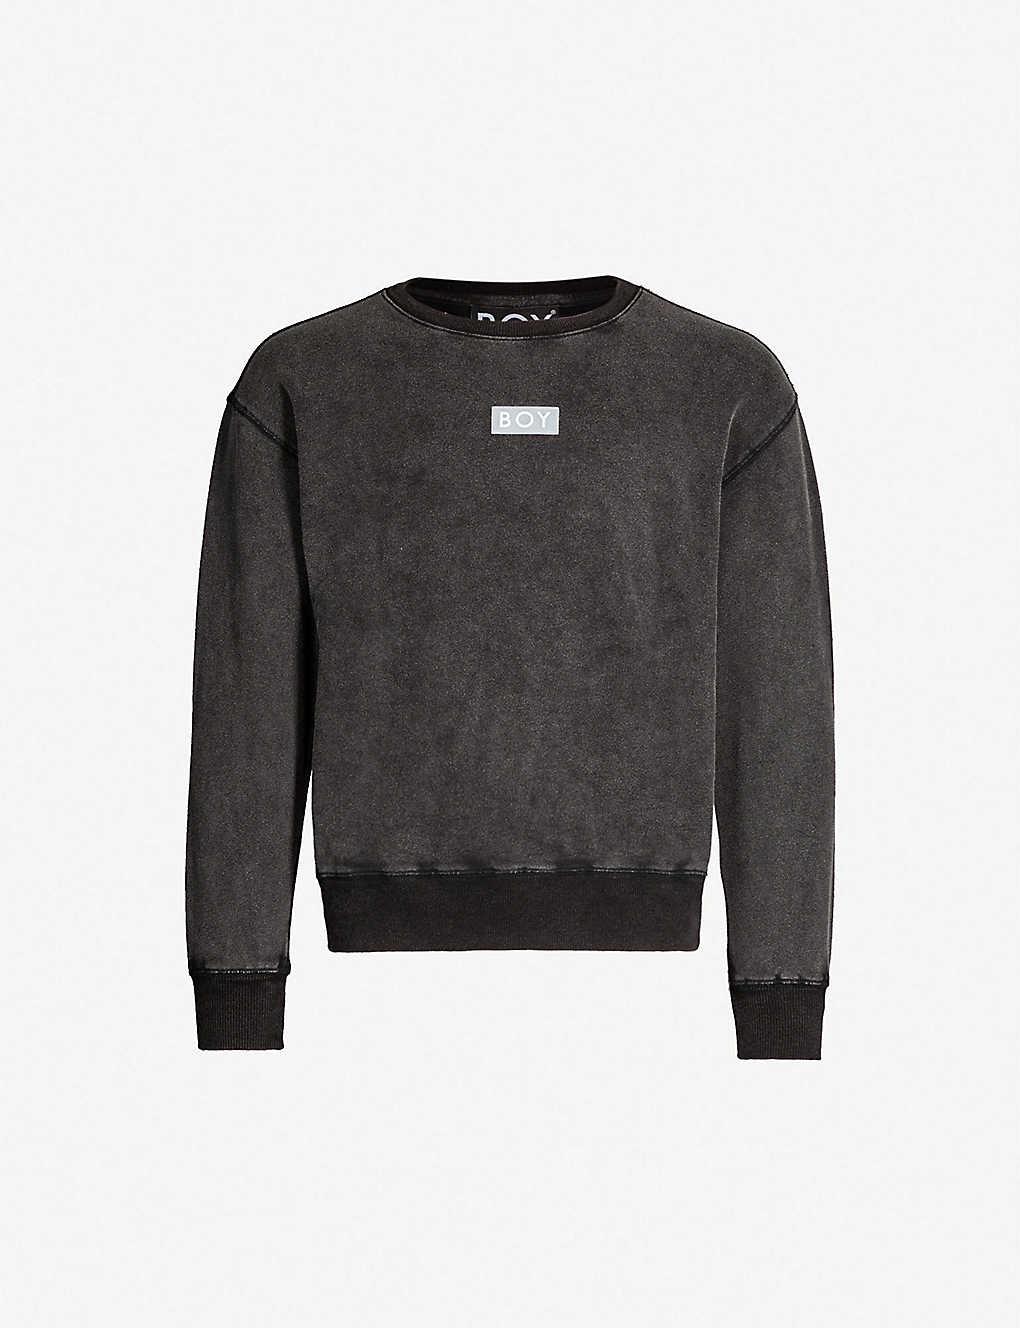 a3ab31ec6 BOY LONDON - Glitch cotton-jersey sweatshirt   Selfridges.com